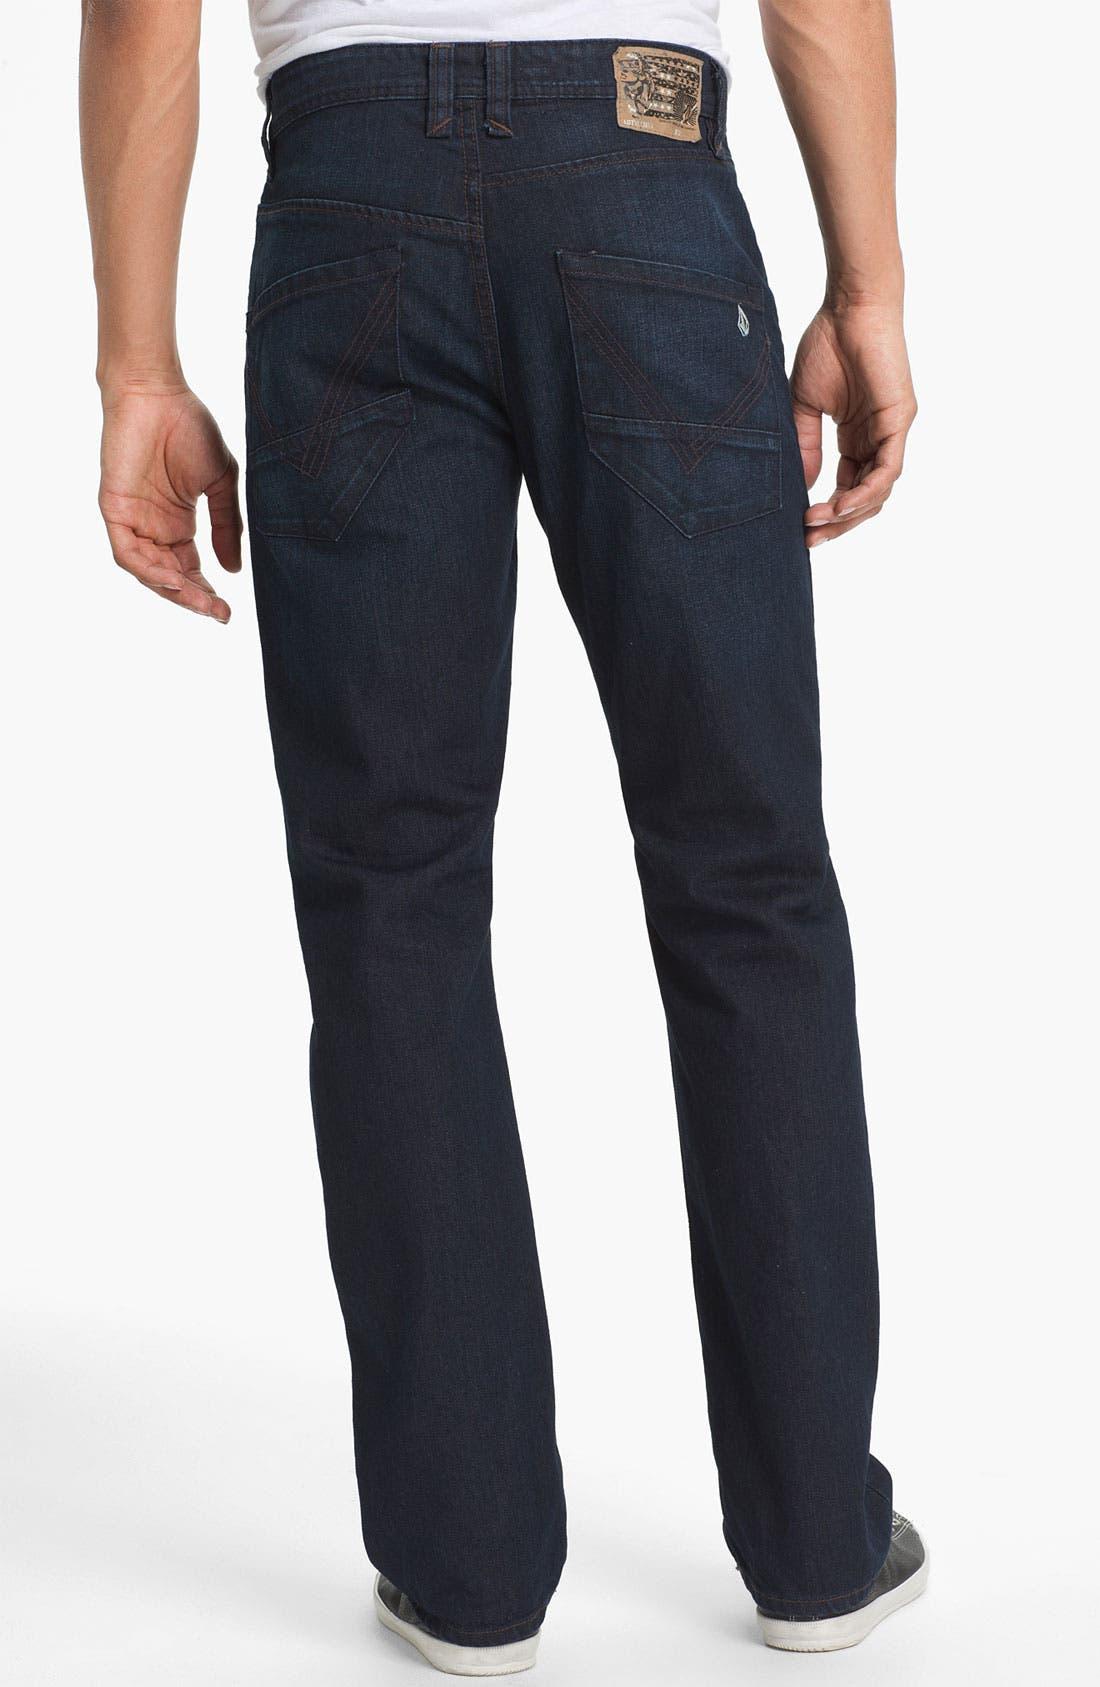 Main Image - Volcom 'Nova' Slim Straight Leg Jeans (VC02) (Online Only)